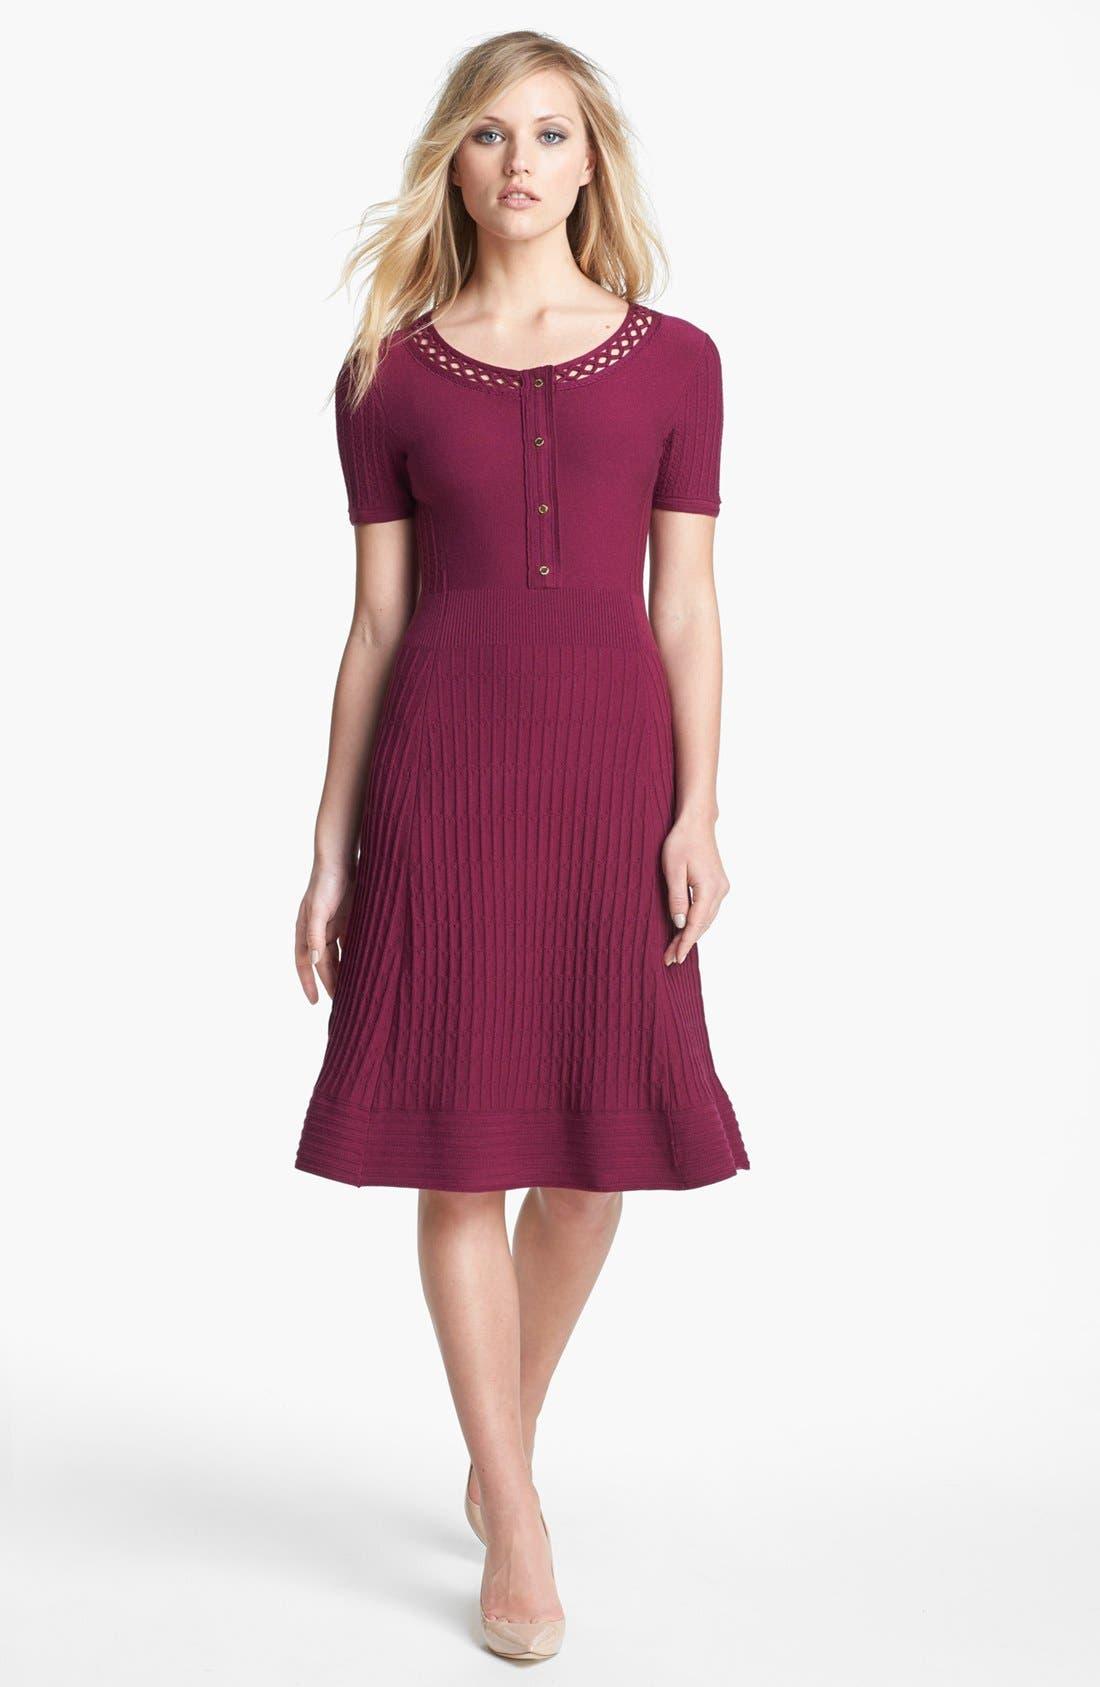 Main Image - Tory Burch 'Ashlyn' Merino Wool Blend Sweater Dress